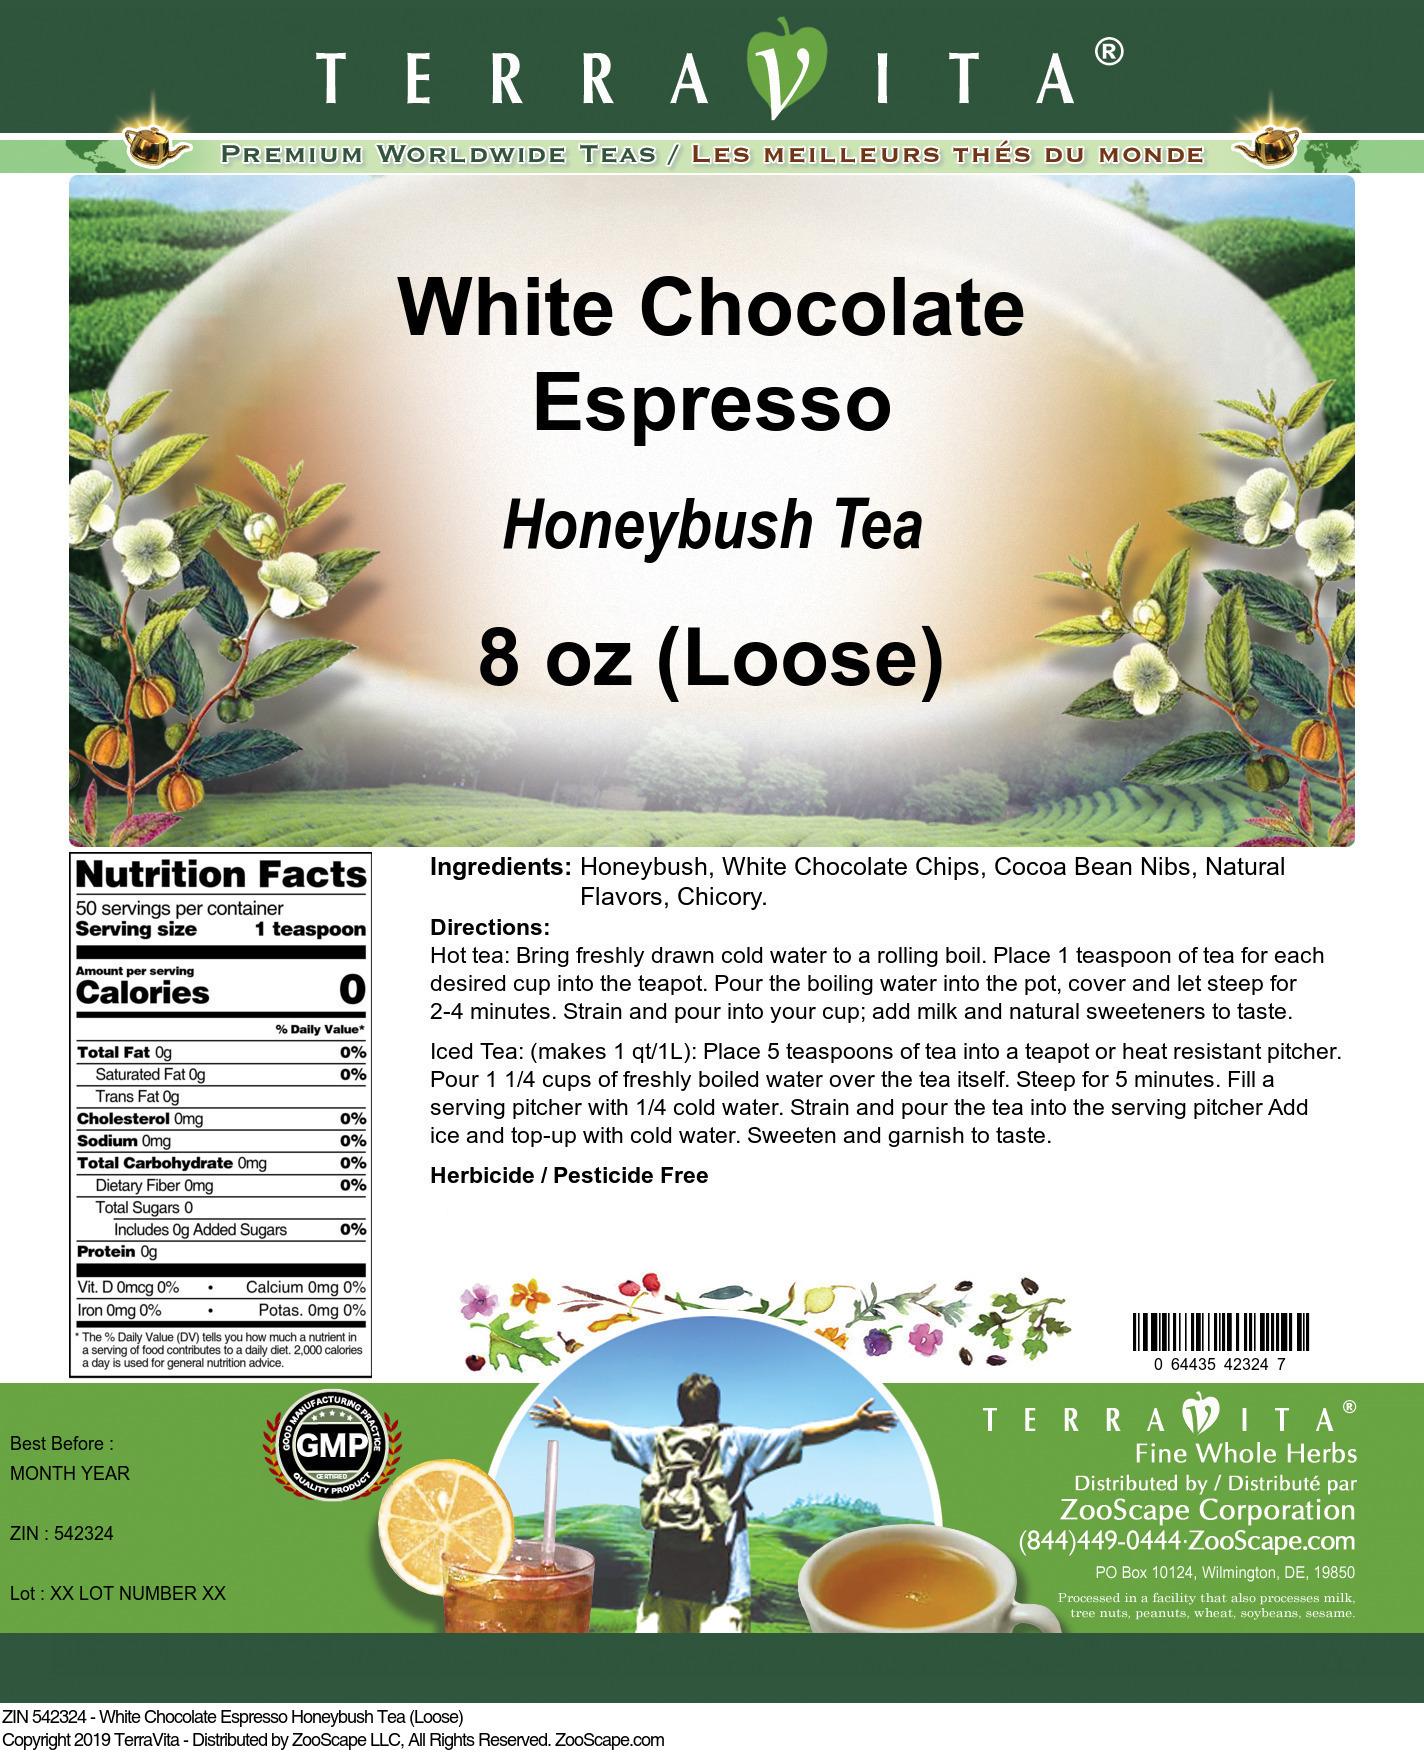 White Chocolate Espresso Honeybush Tea